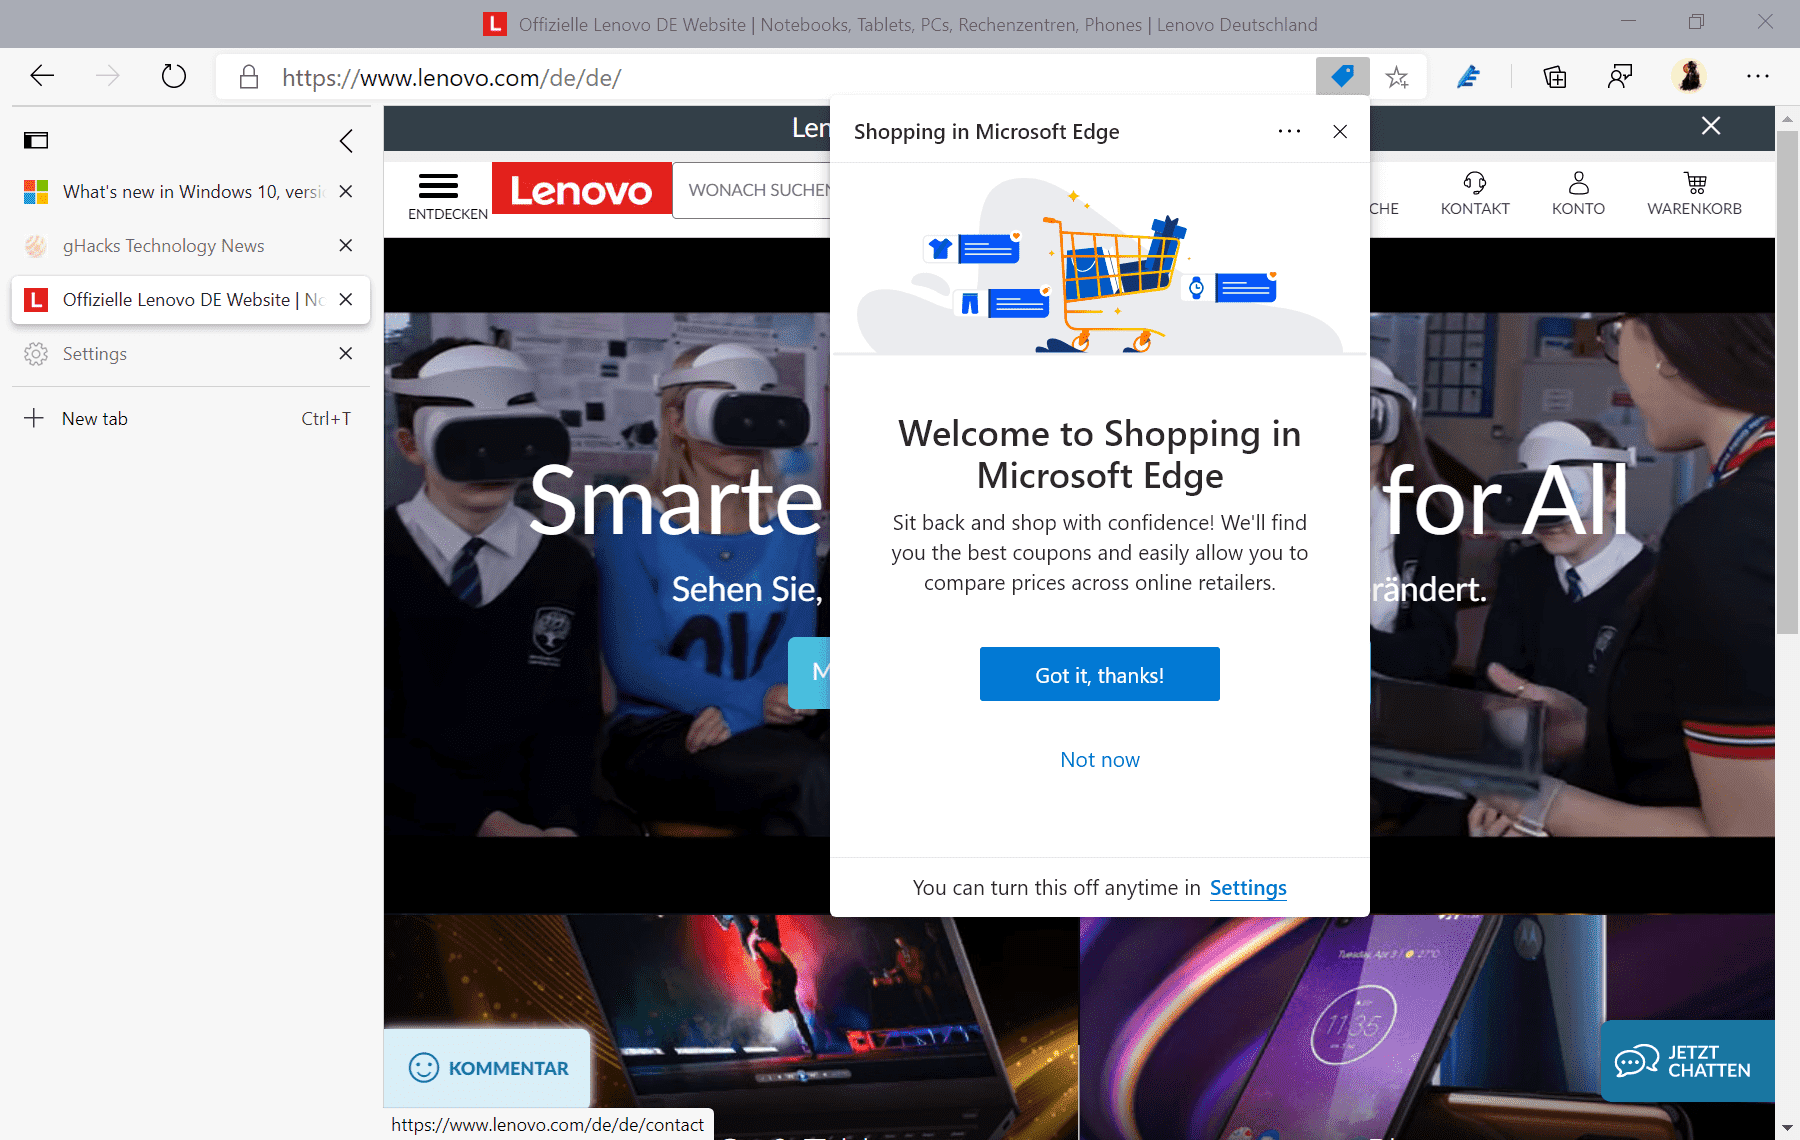 achats Microsoft Edge